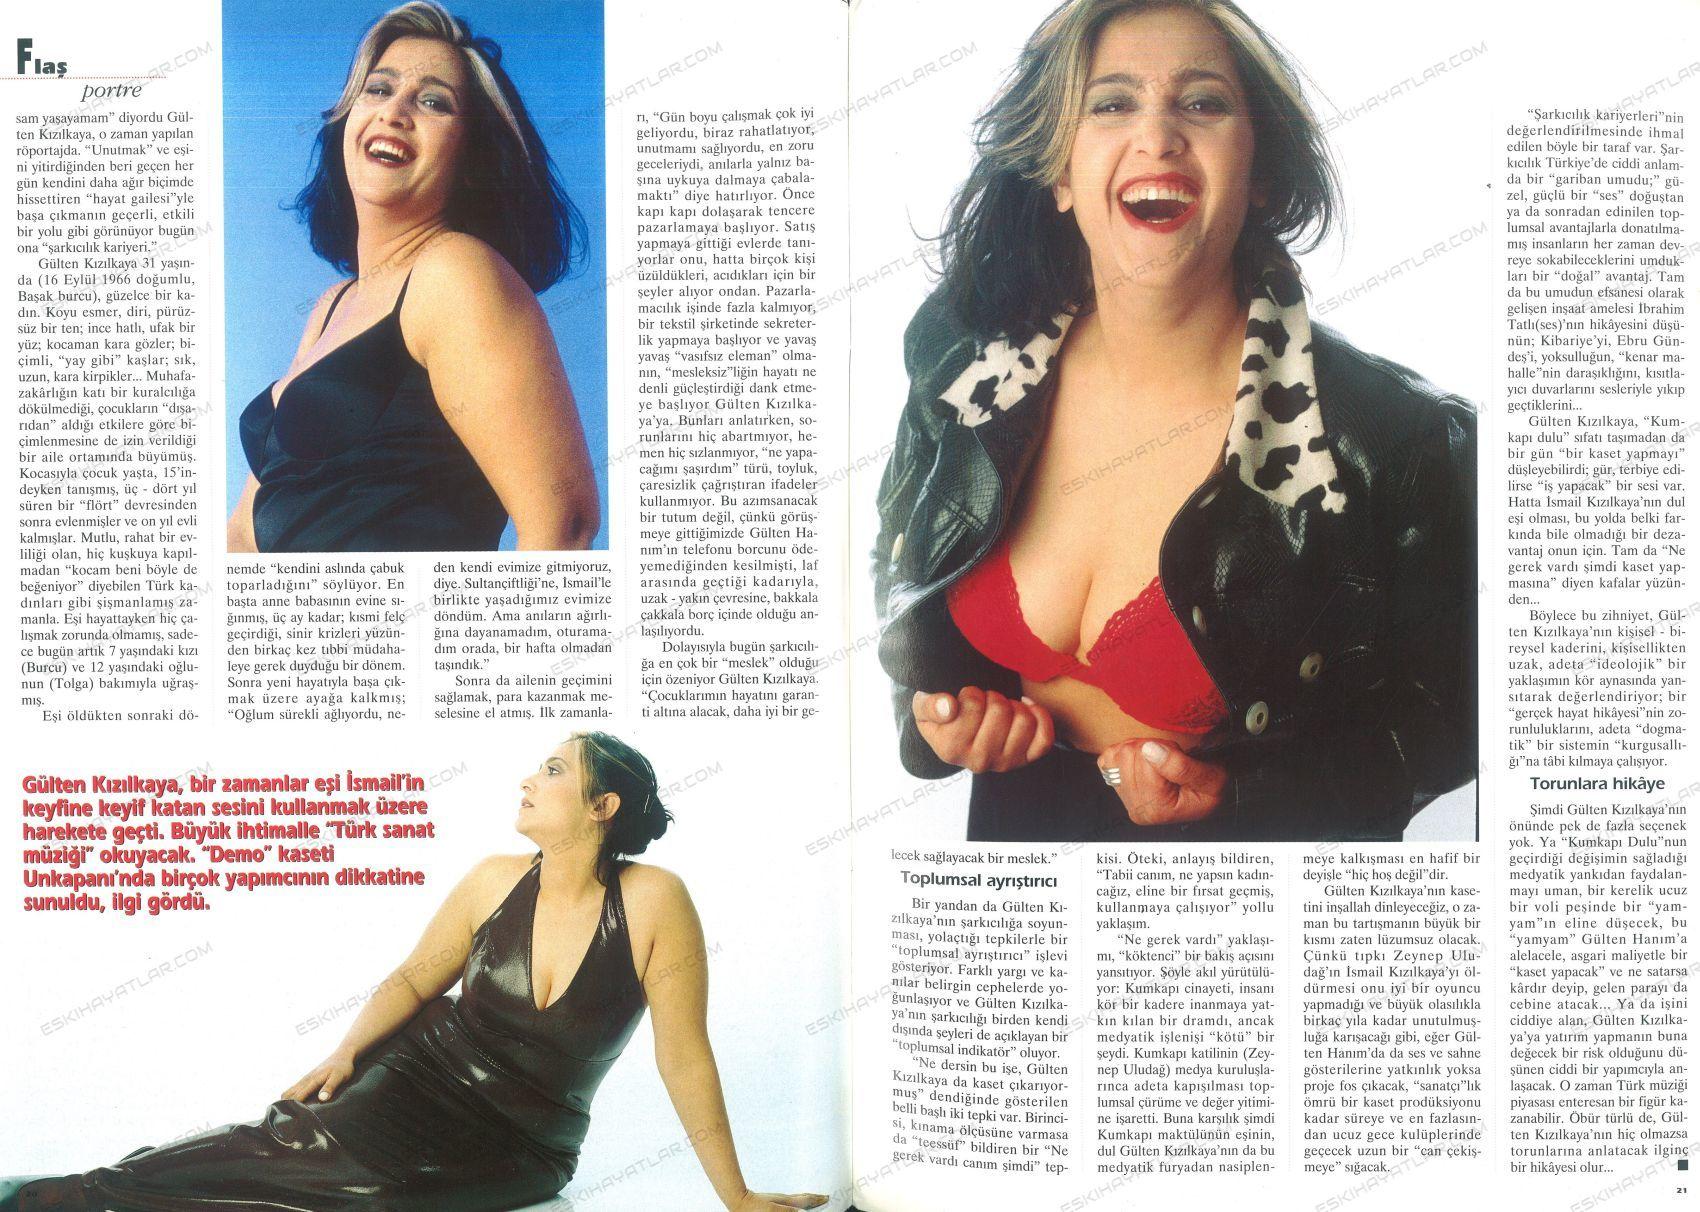 0239-kumkapi-cinayeti-1998-aktuel-dergisi-gulten-kizilkaya-kumkapi-dulu-kimdir (2)